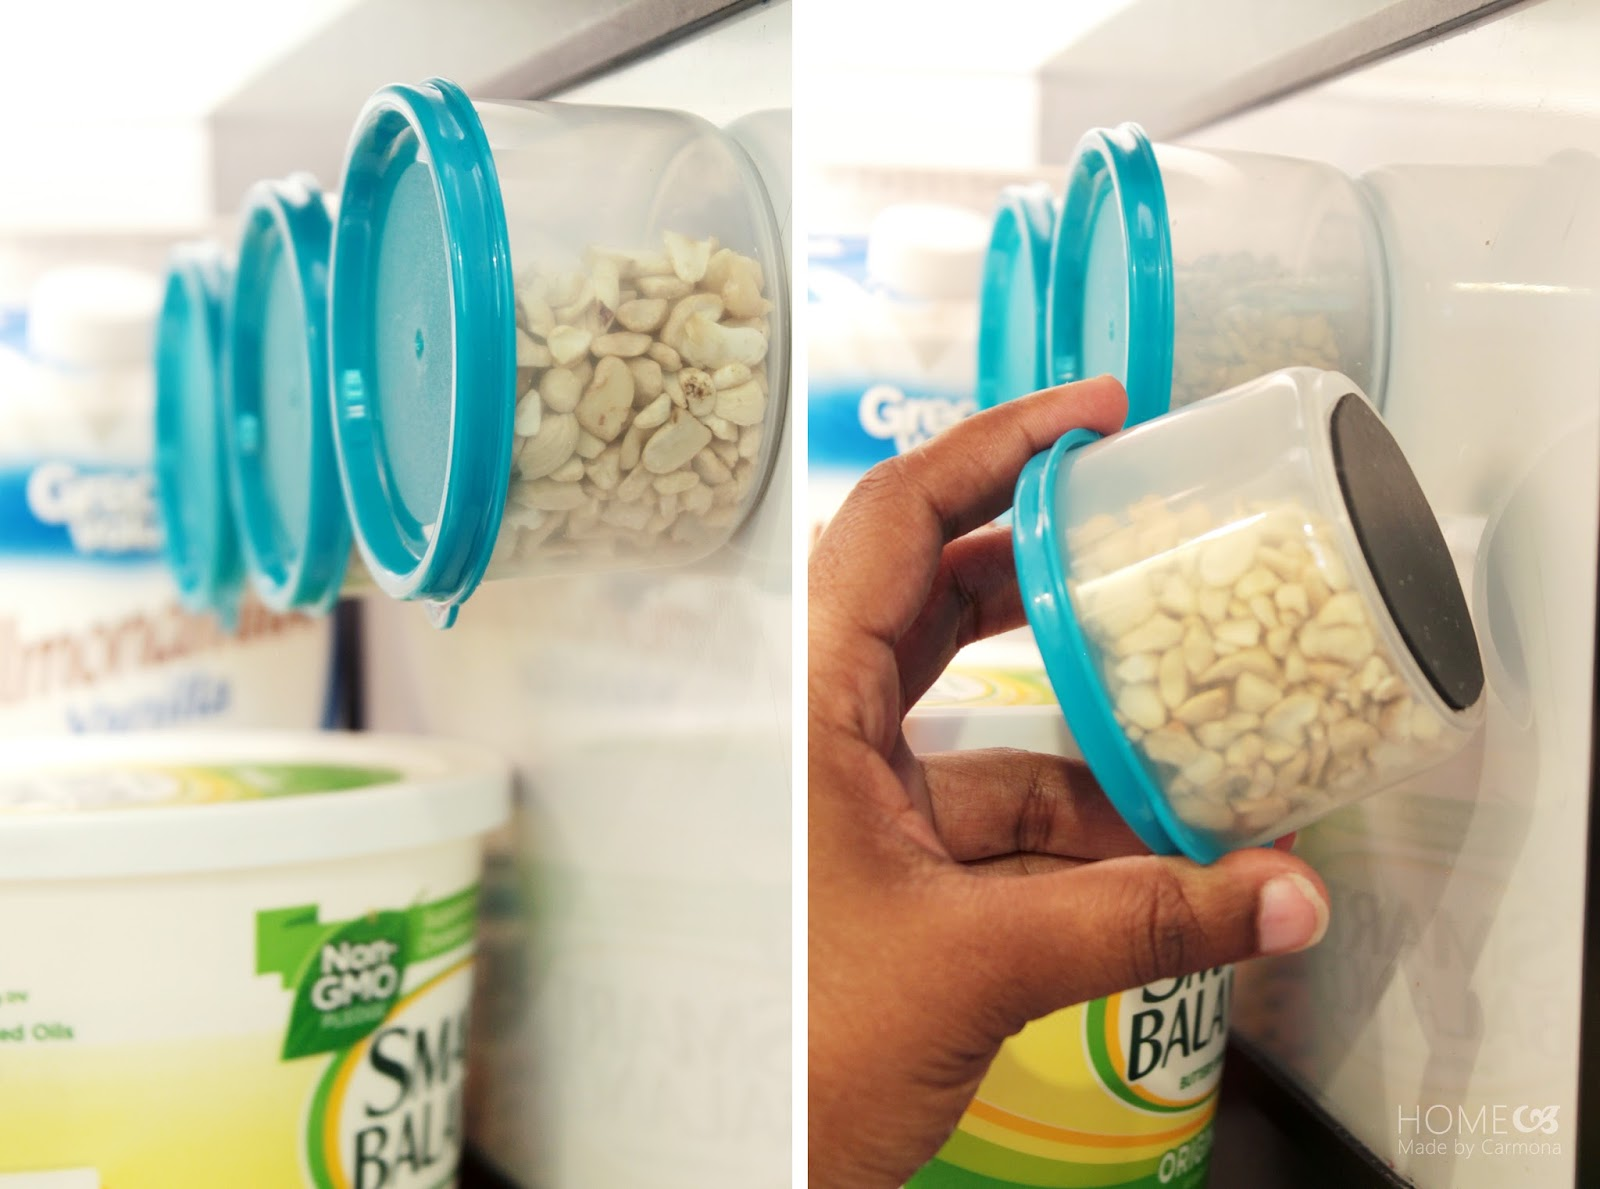 magnetic-plastic-containers-fridge-organization.jpg